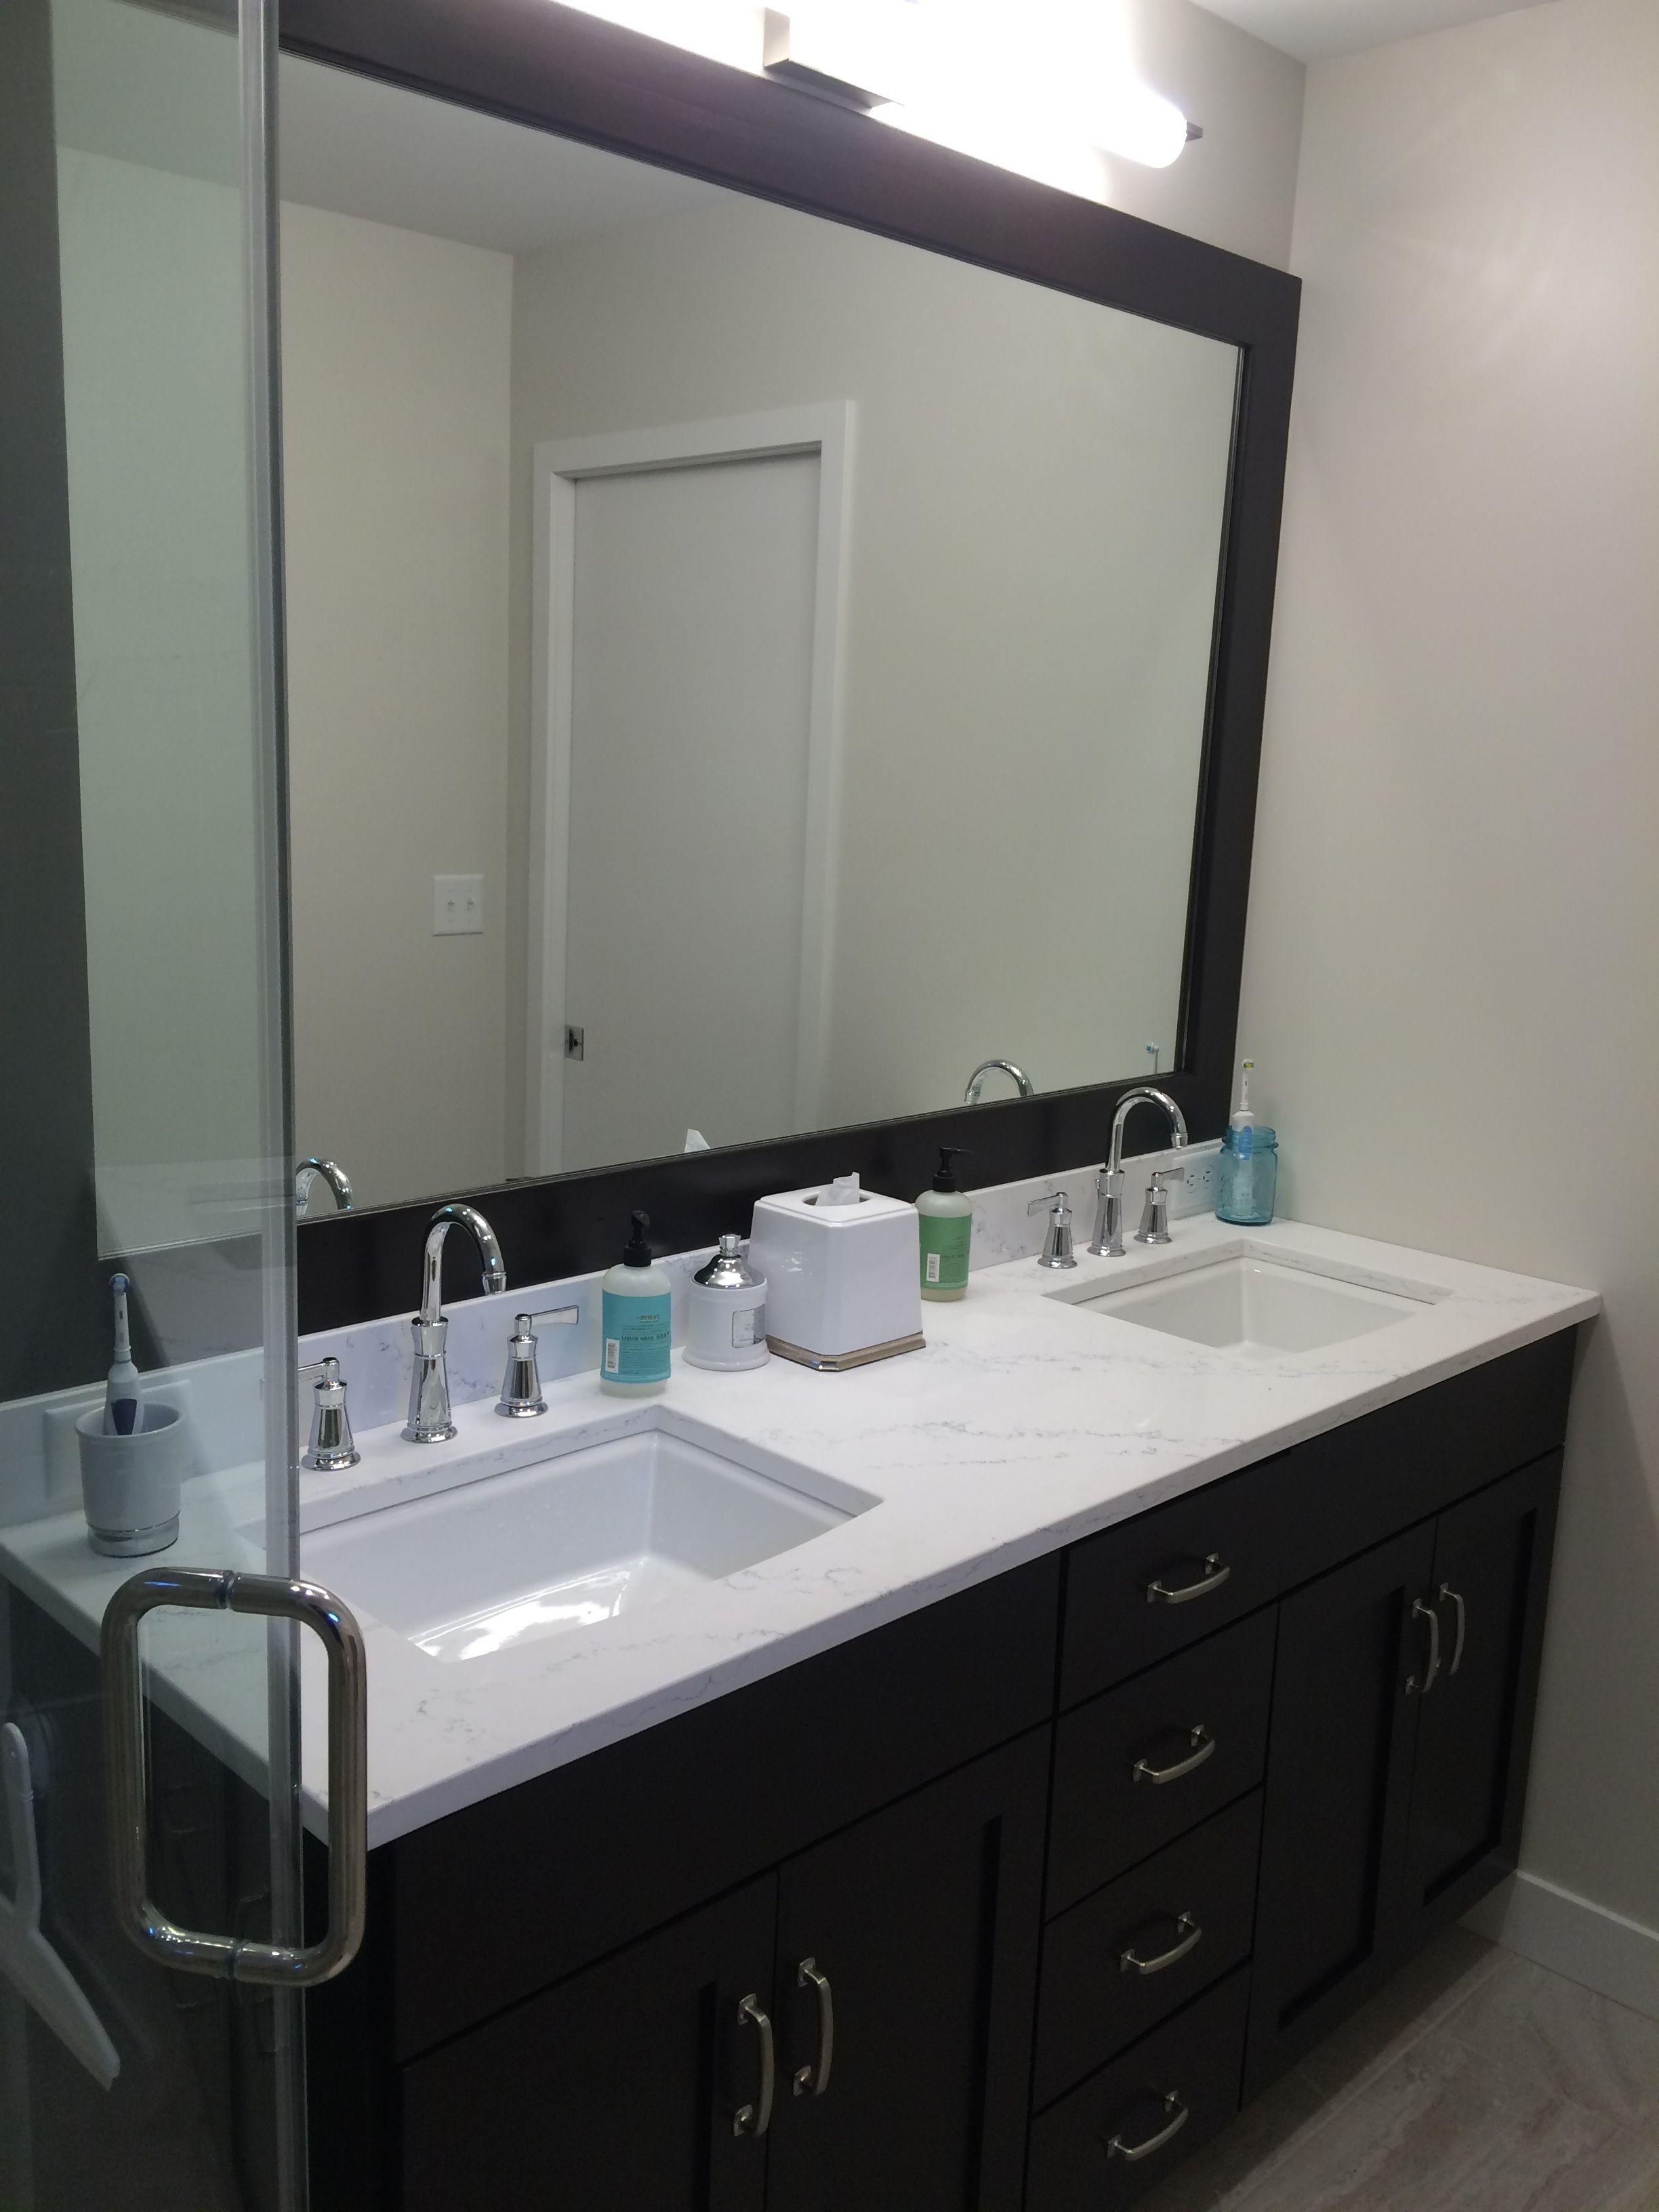 Custom vanity with espresso stain with quartz countertop